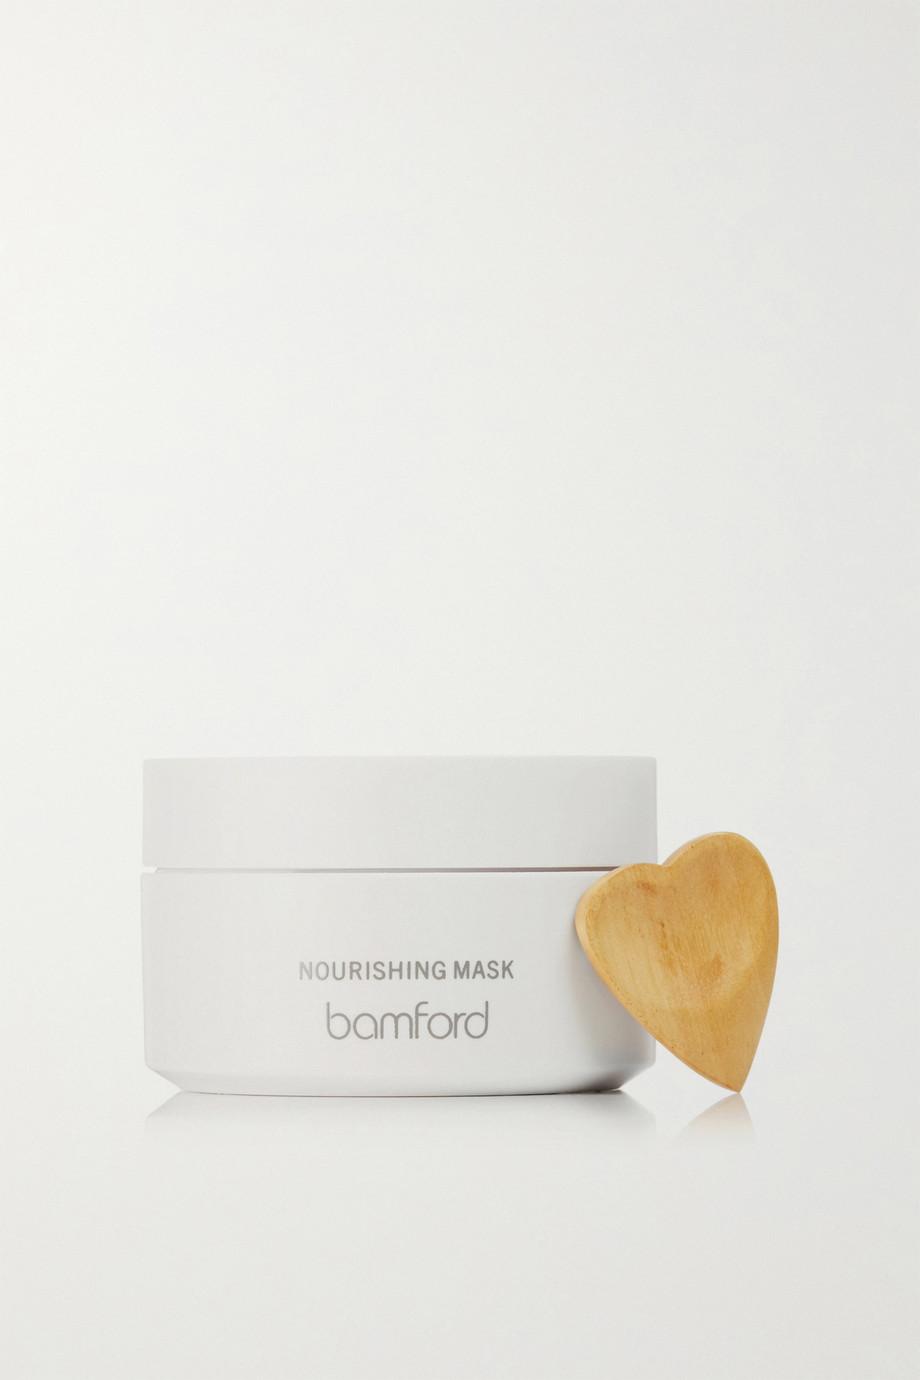 Bamford Nourishing Mask, 45ml